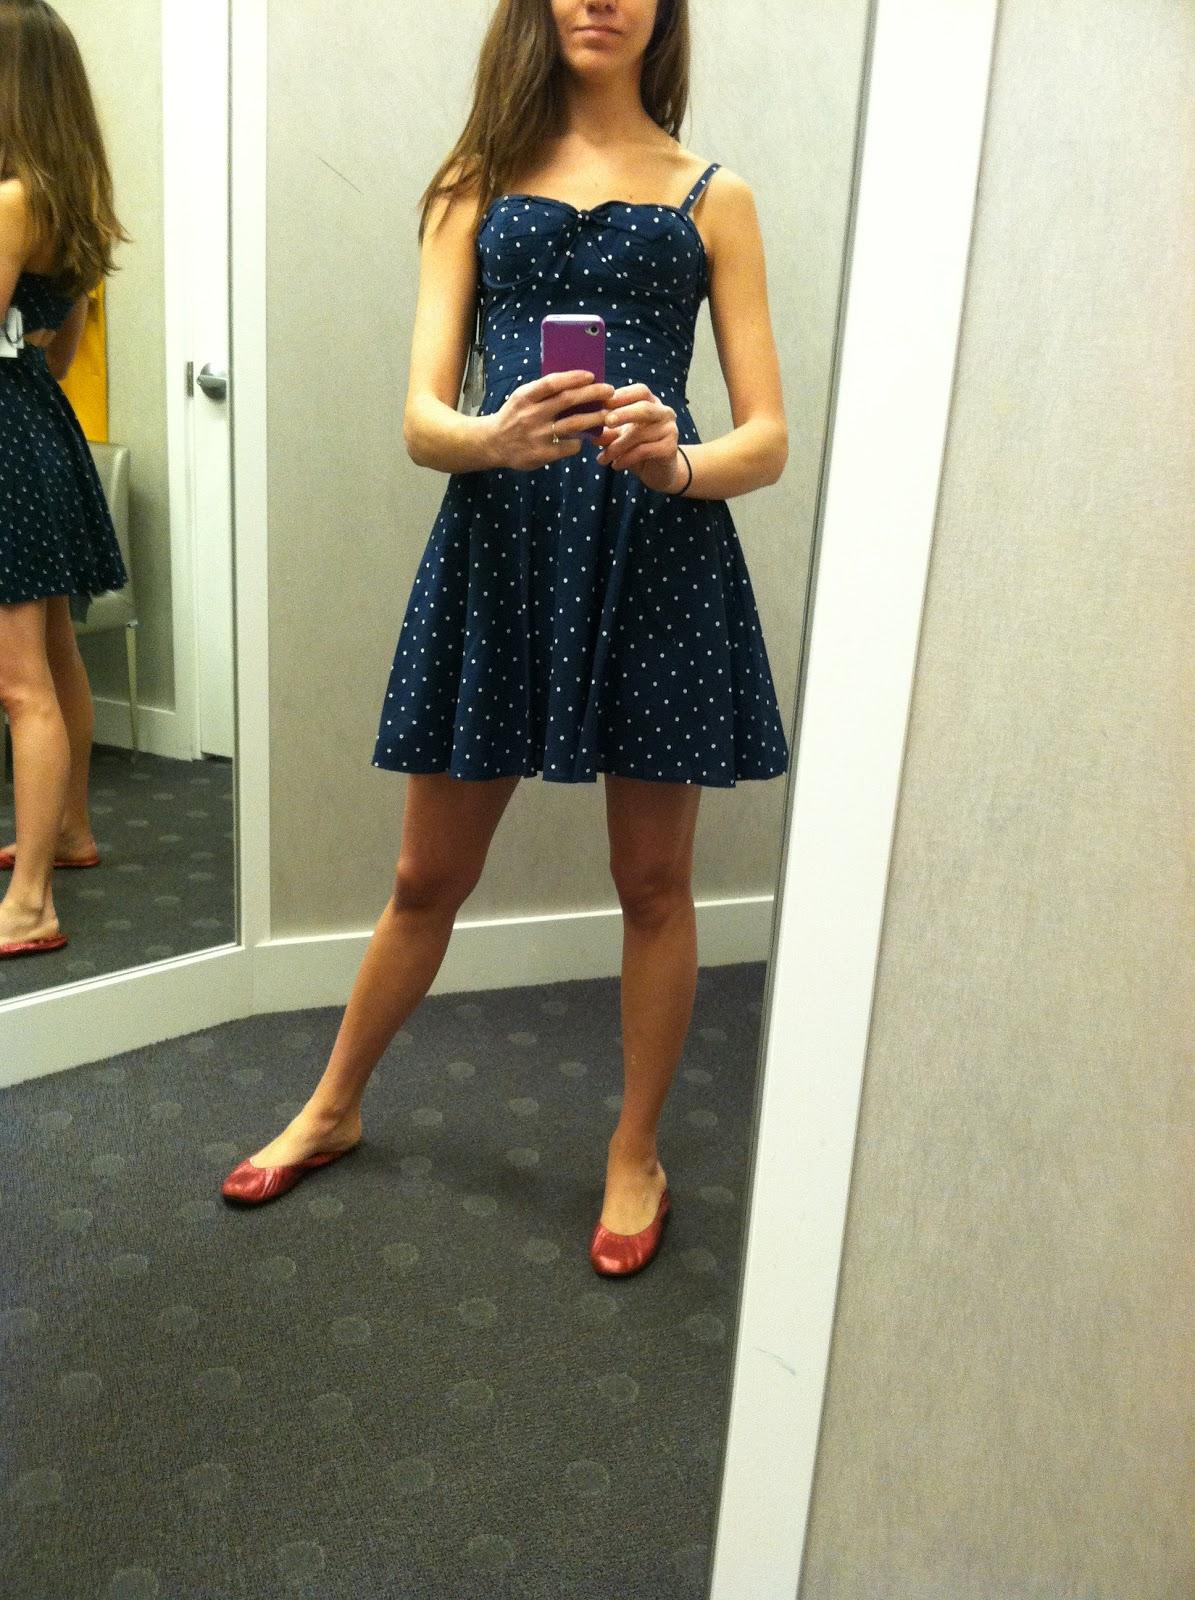 Jessica Simpson Lace Feather Dress 6k Pics